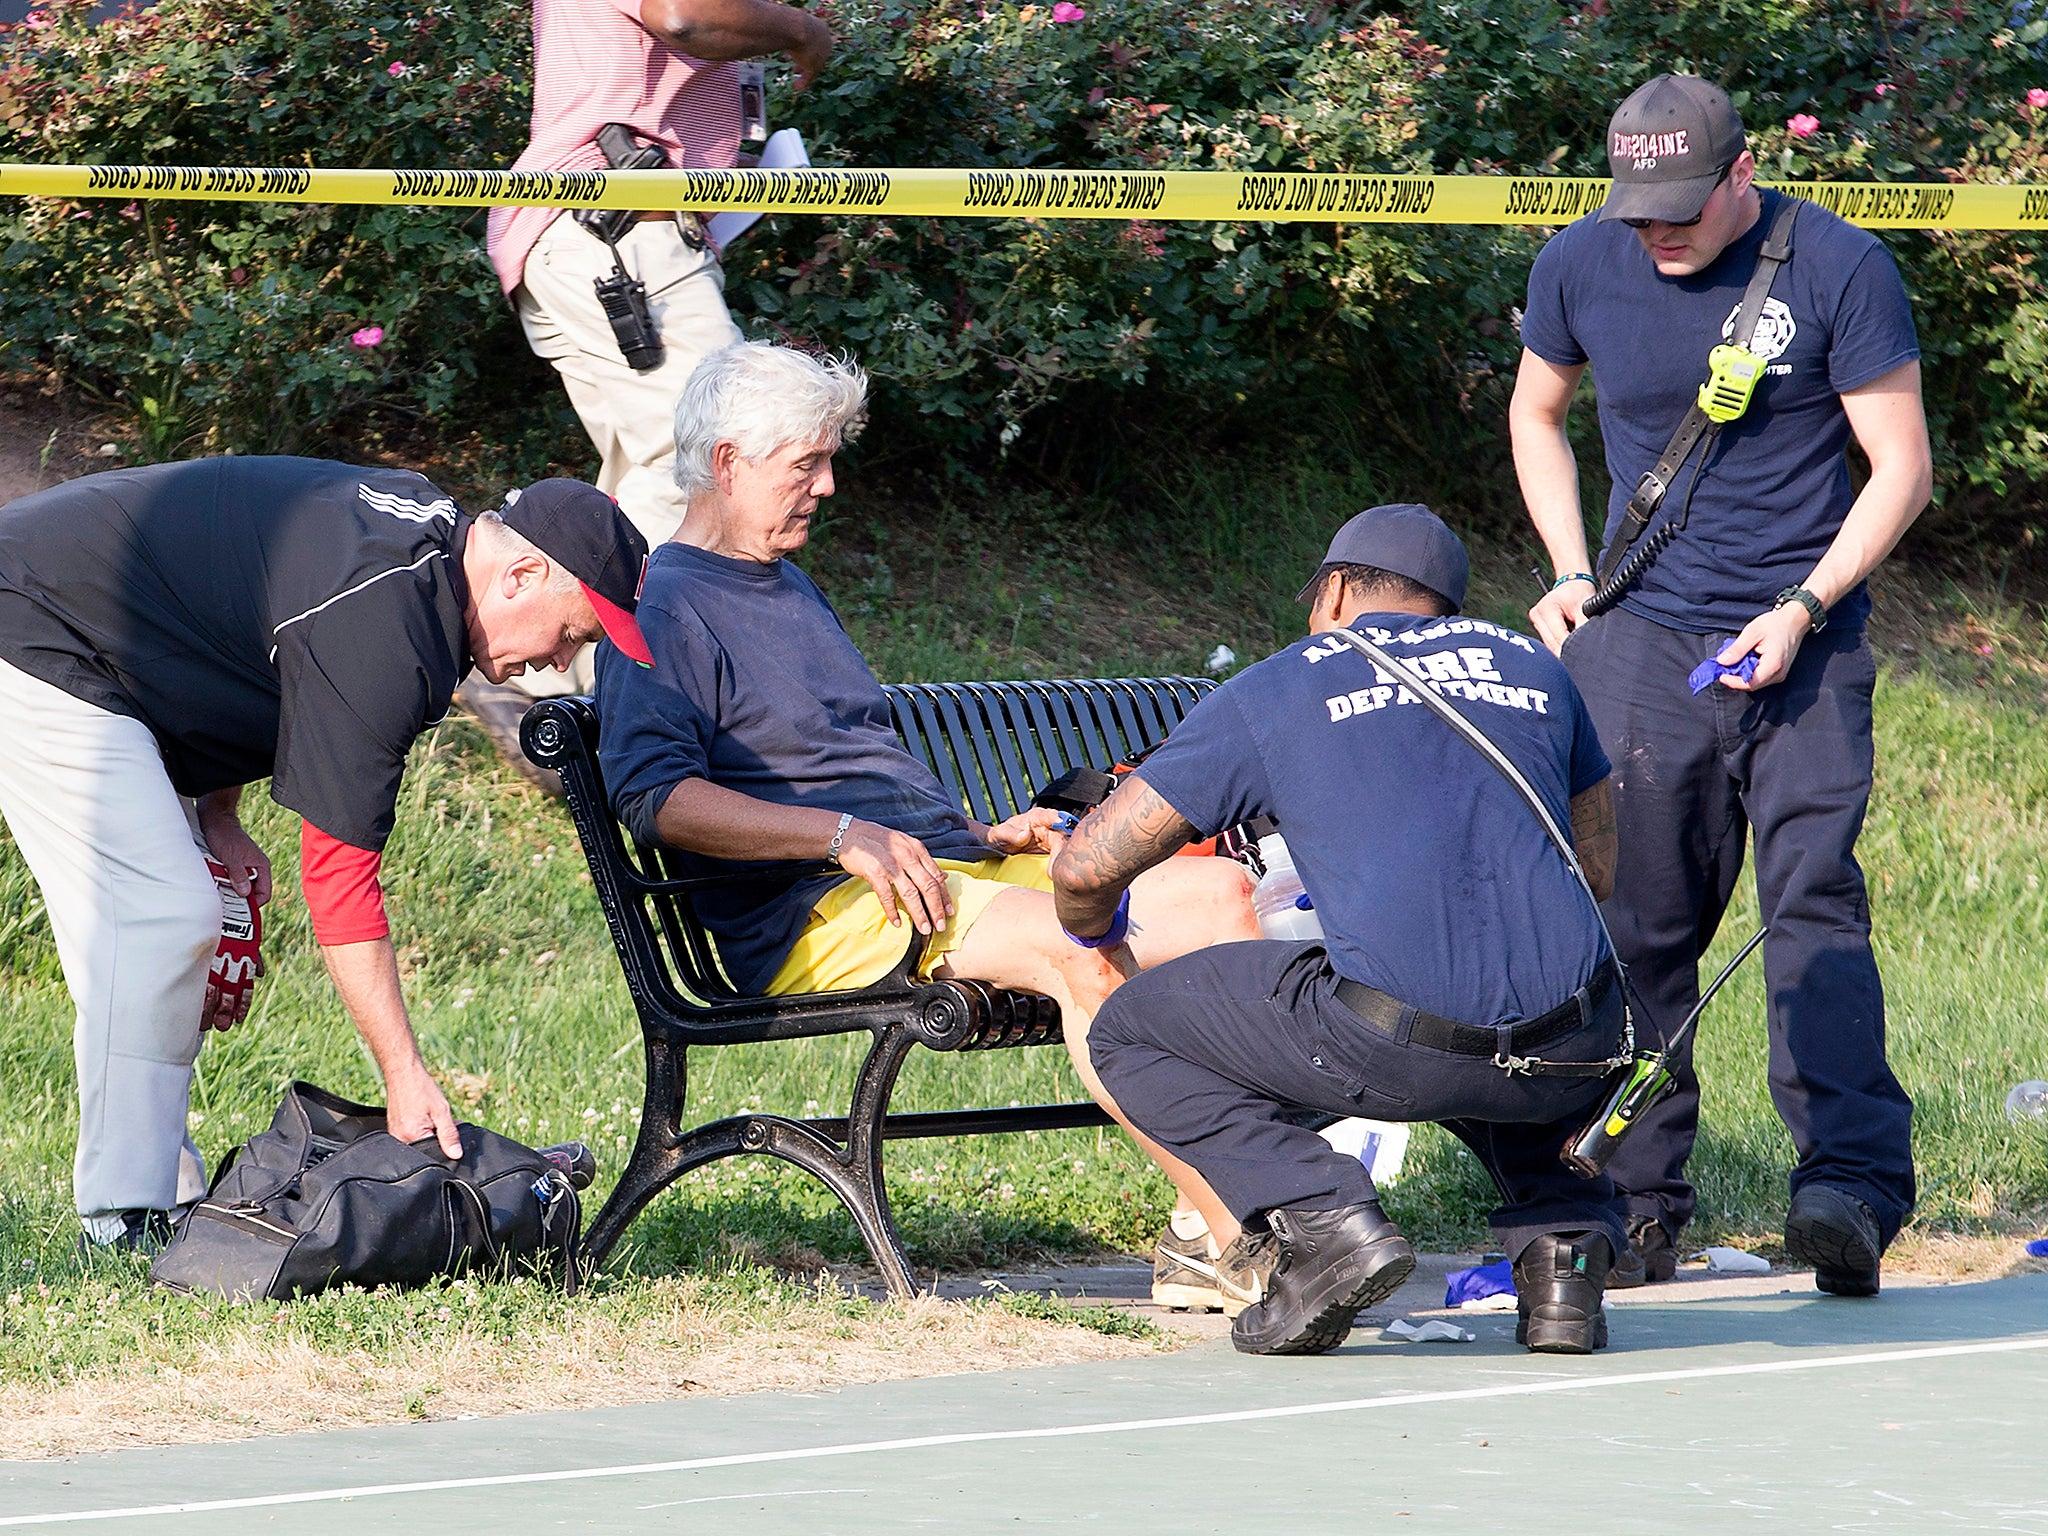 James Hodgkinson dead: Virginia shooter dies after opening